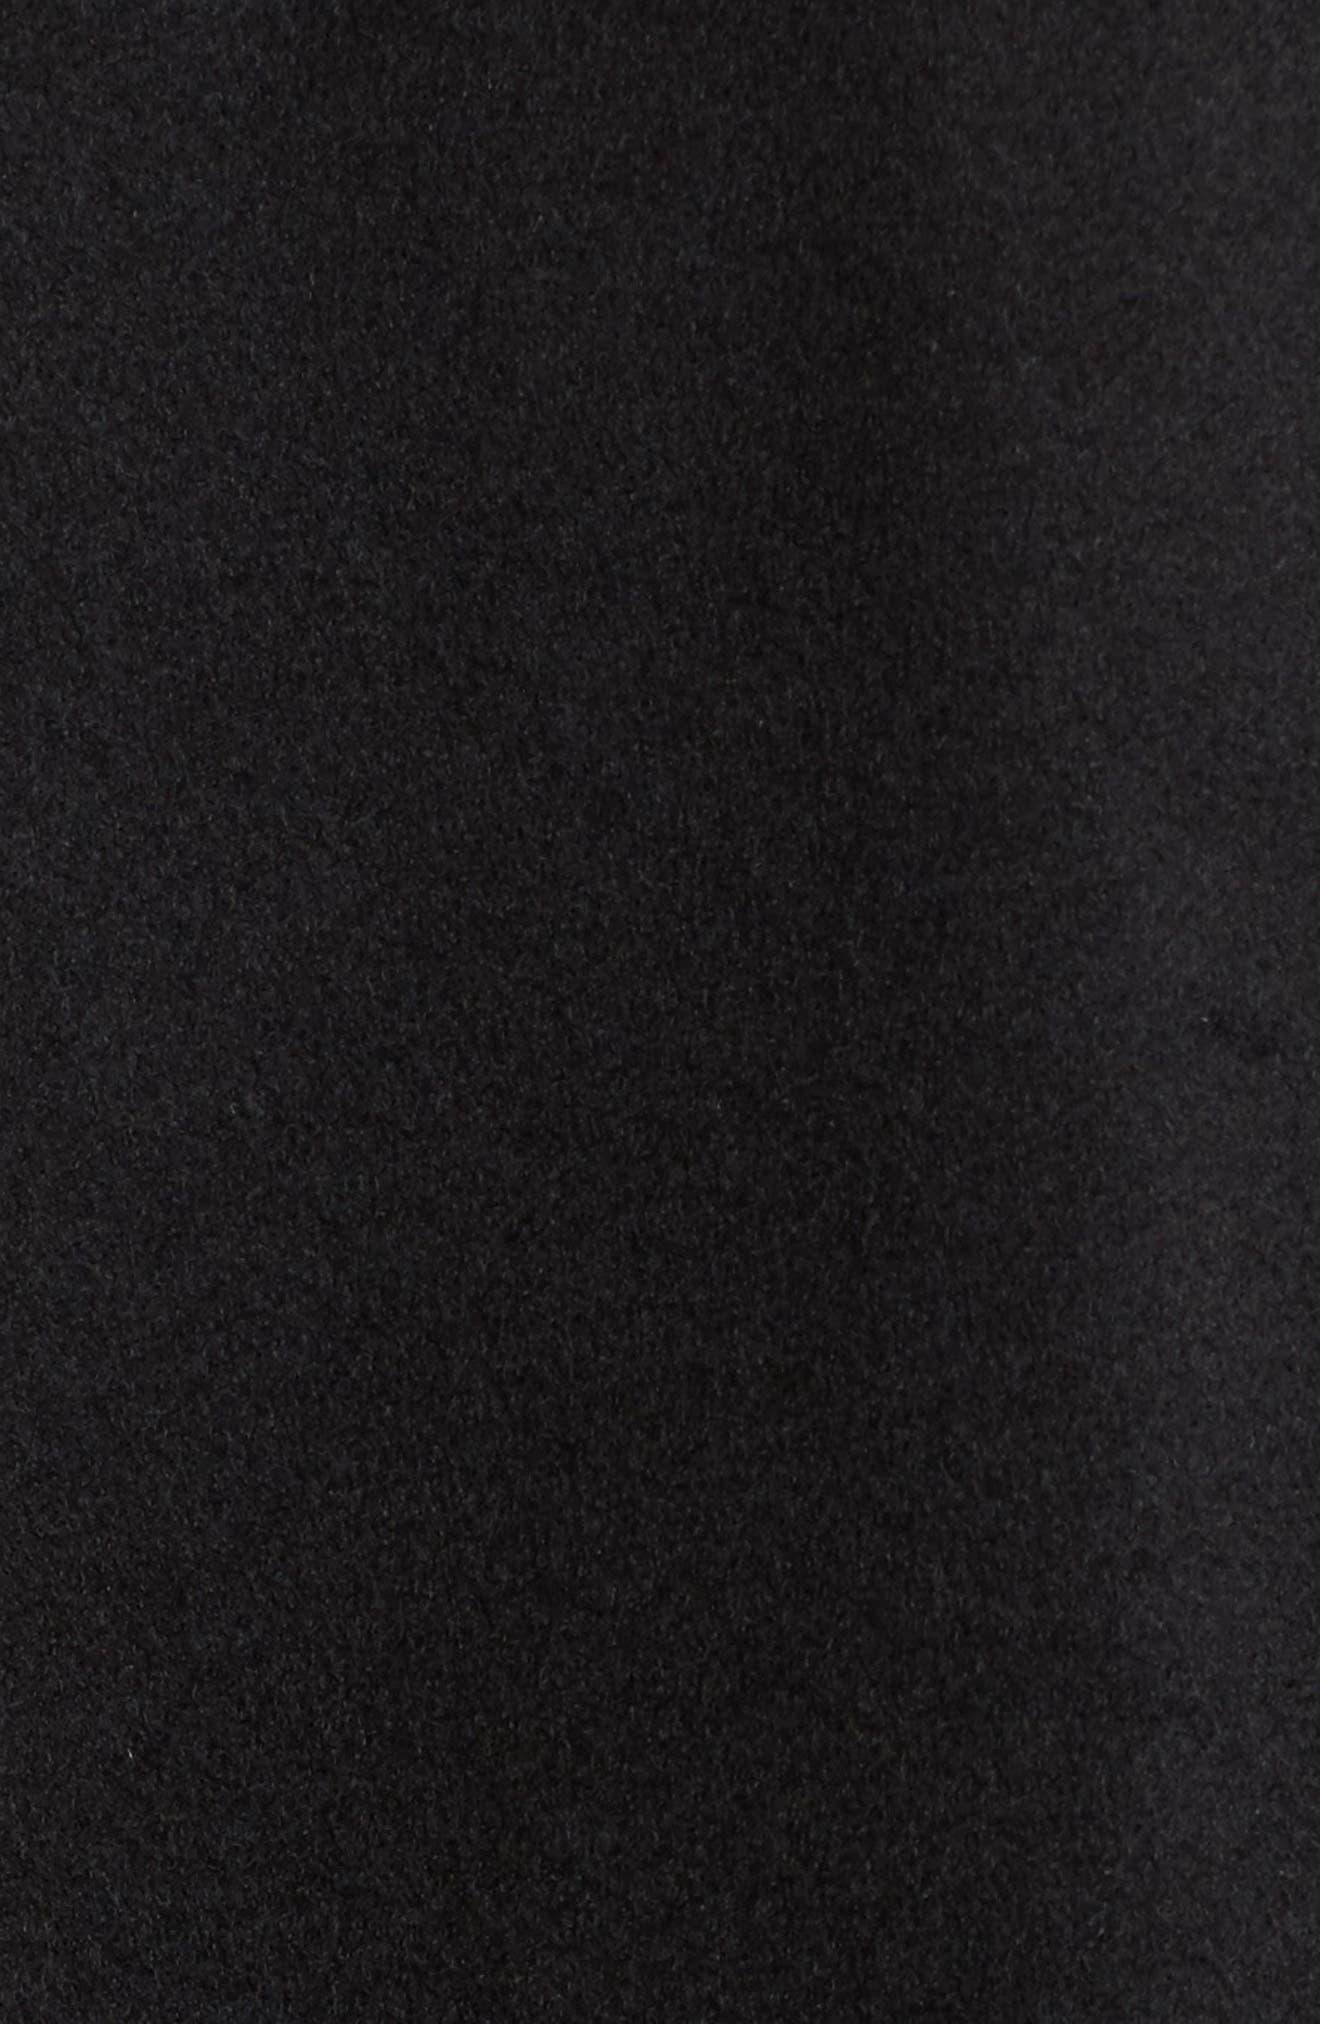 Manchester Waterproof Field Coat,                             Alternate thumbnail 5, color,                             Black